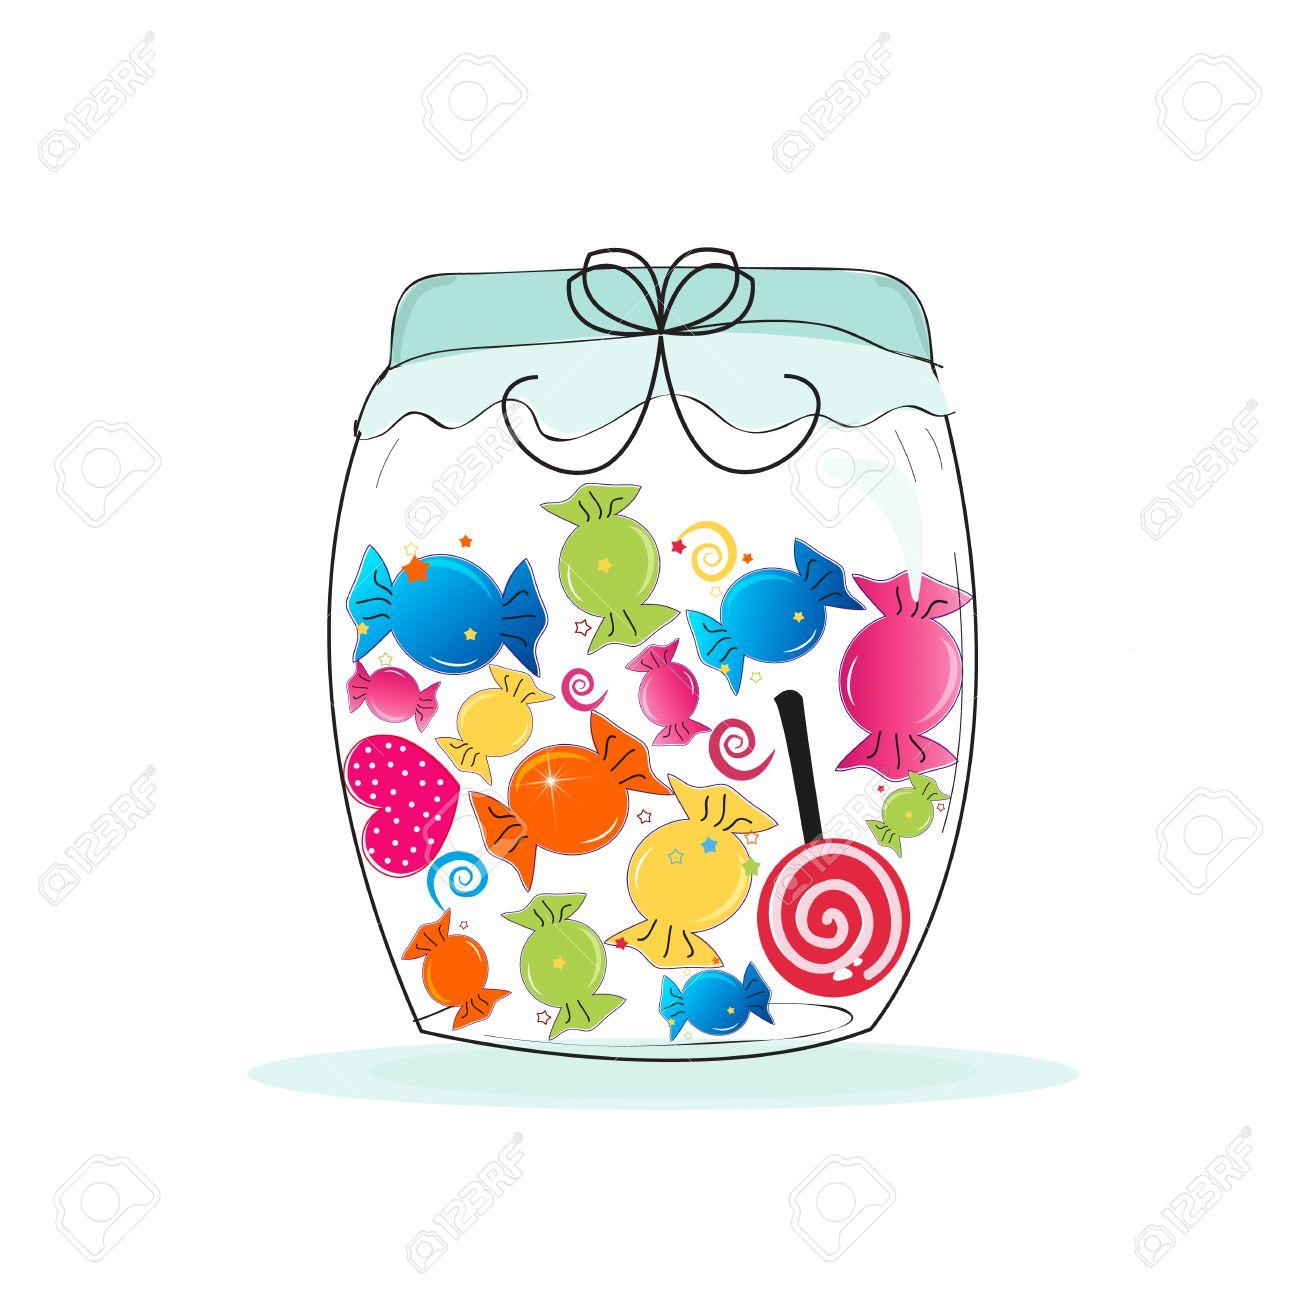 Jar clipart candy jar. Station